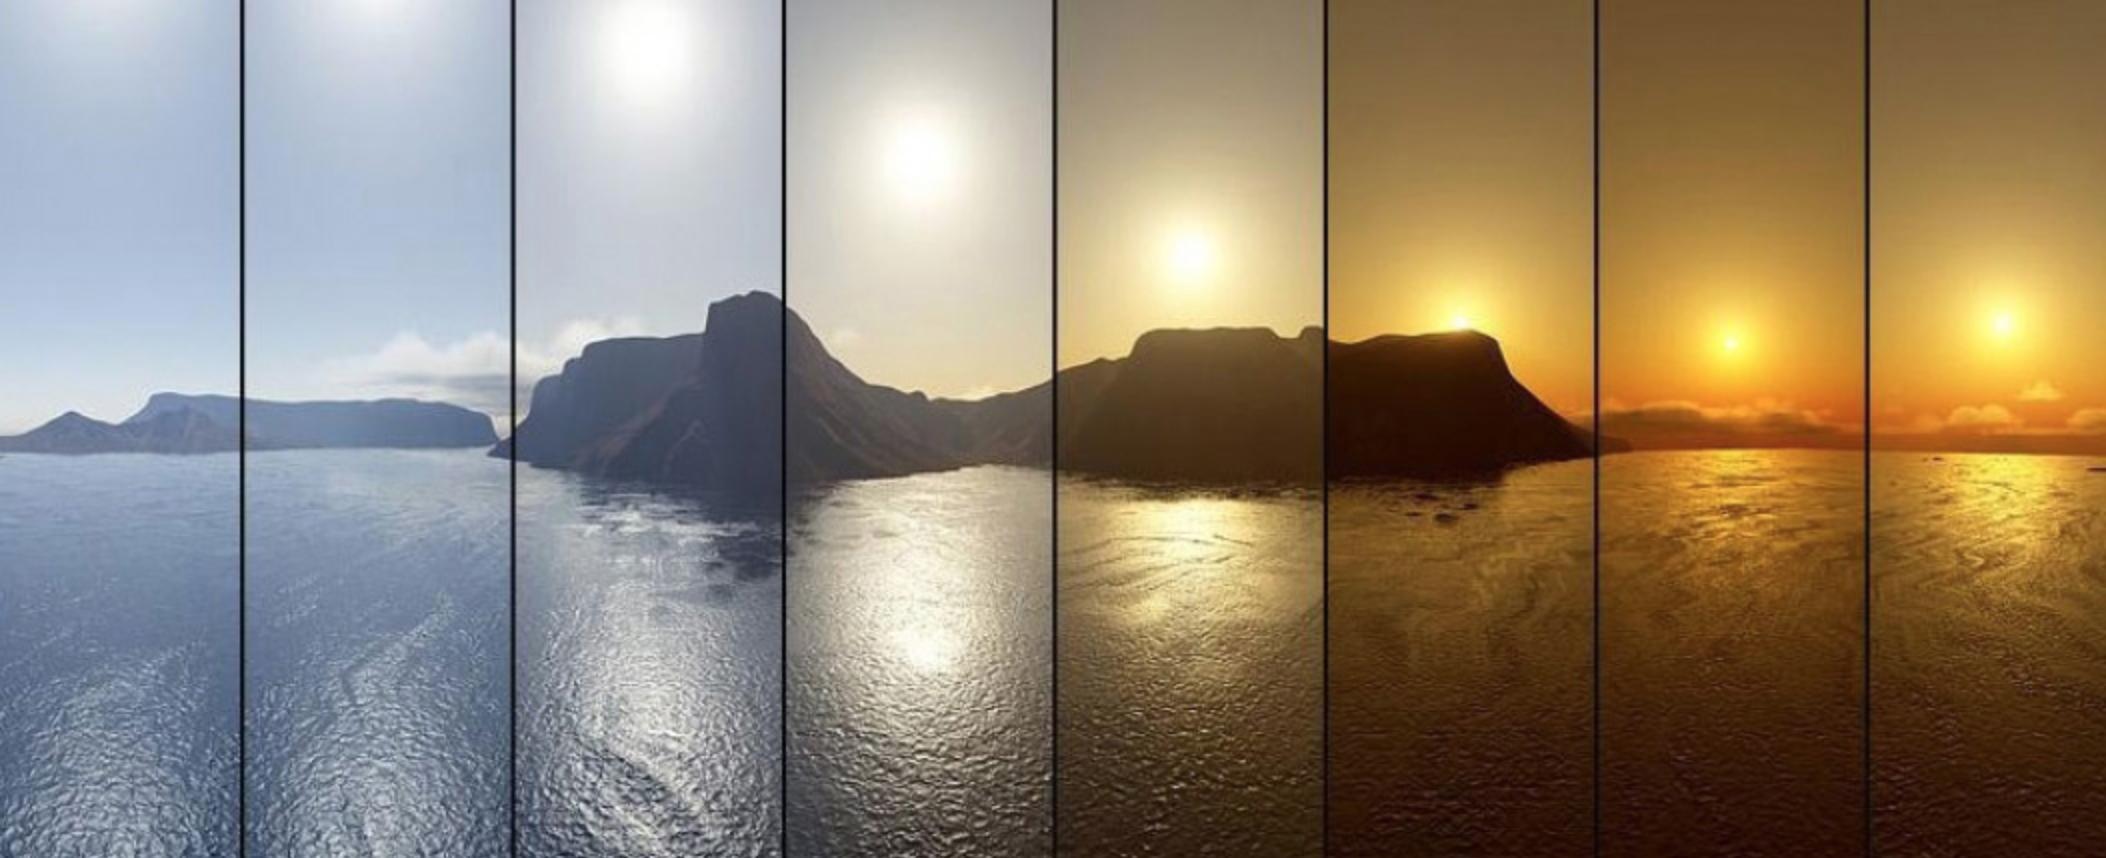 eleanor-bell-technical-tips-colour-temperature-circadian-adaptive-lighting-sunlight.jpg